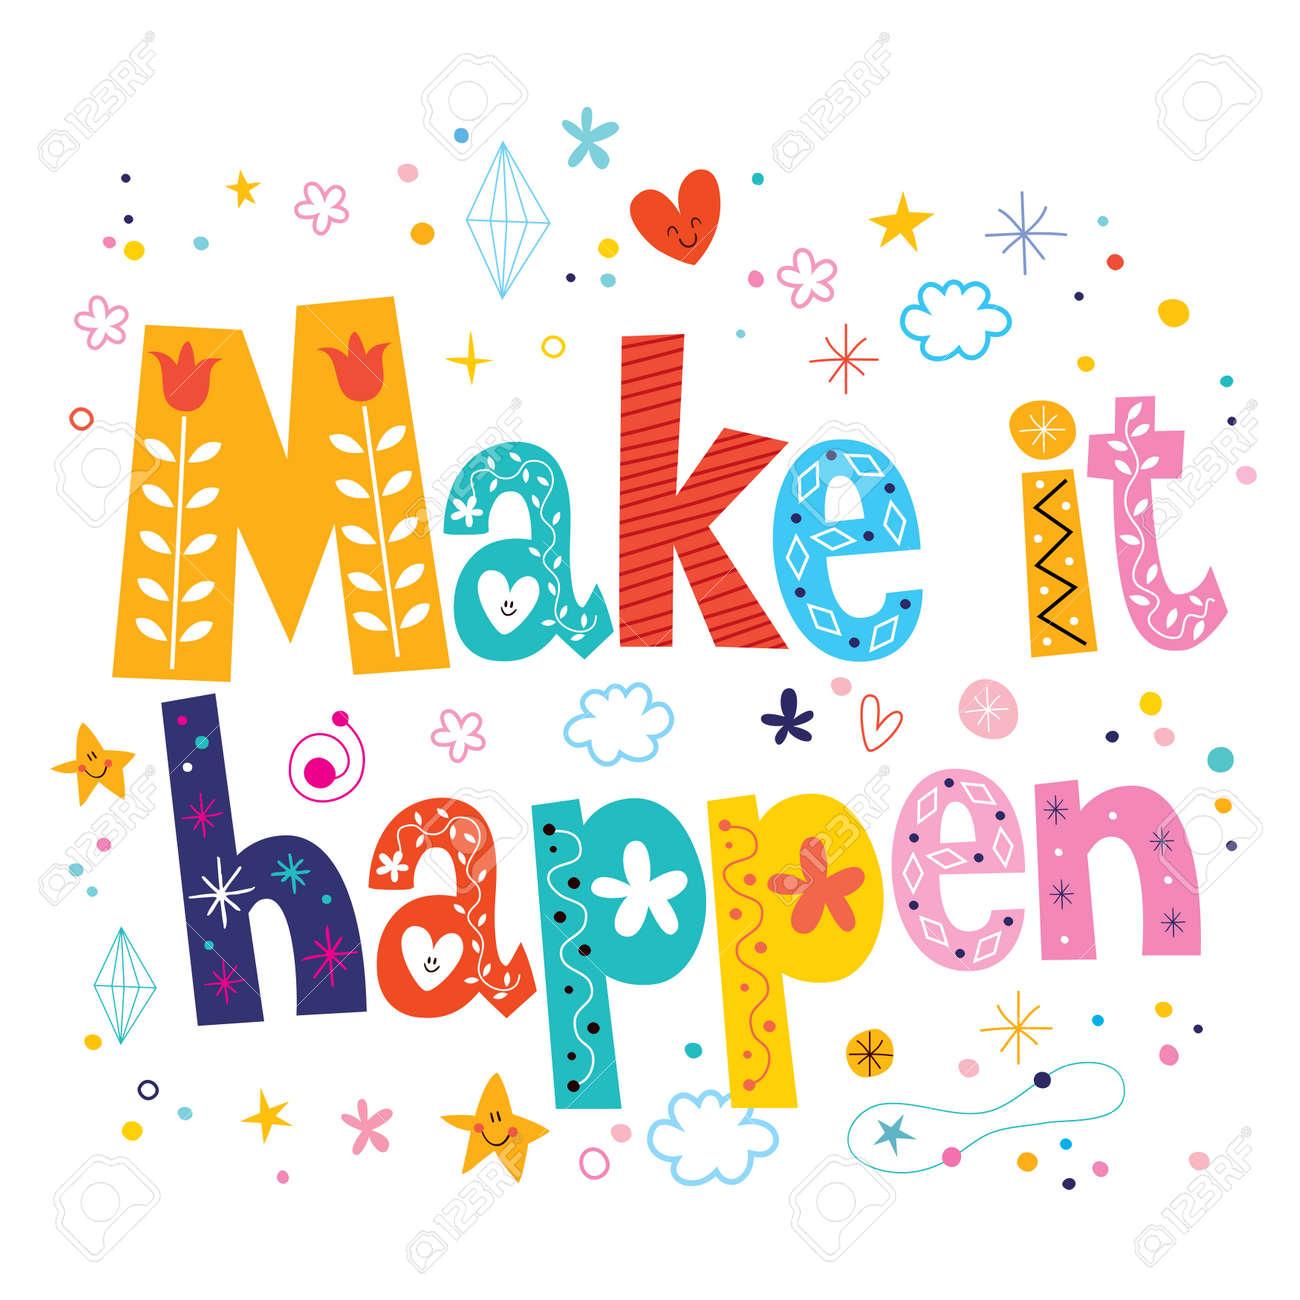 Make It Happen >> Make It Happen Phrase Motivational Quote Royalty Free Stok Fotograf